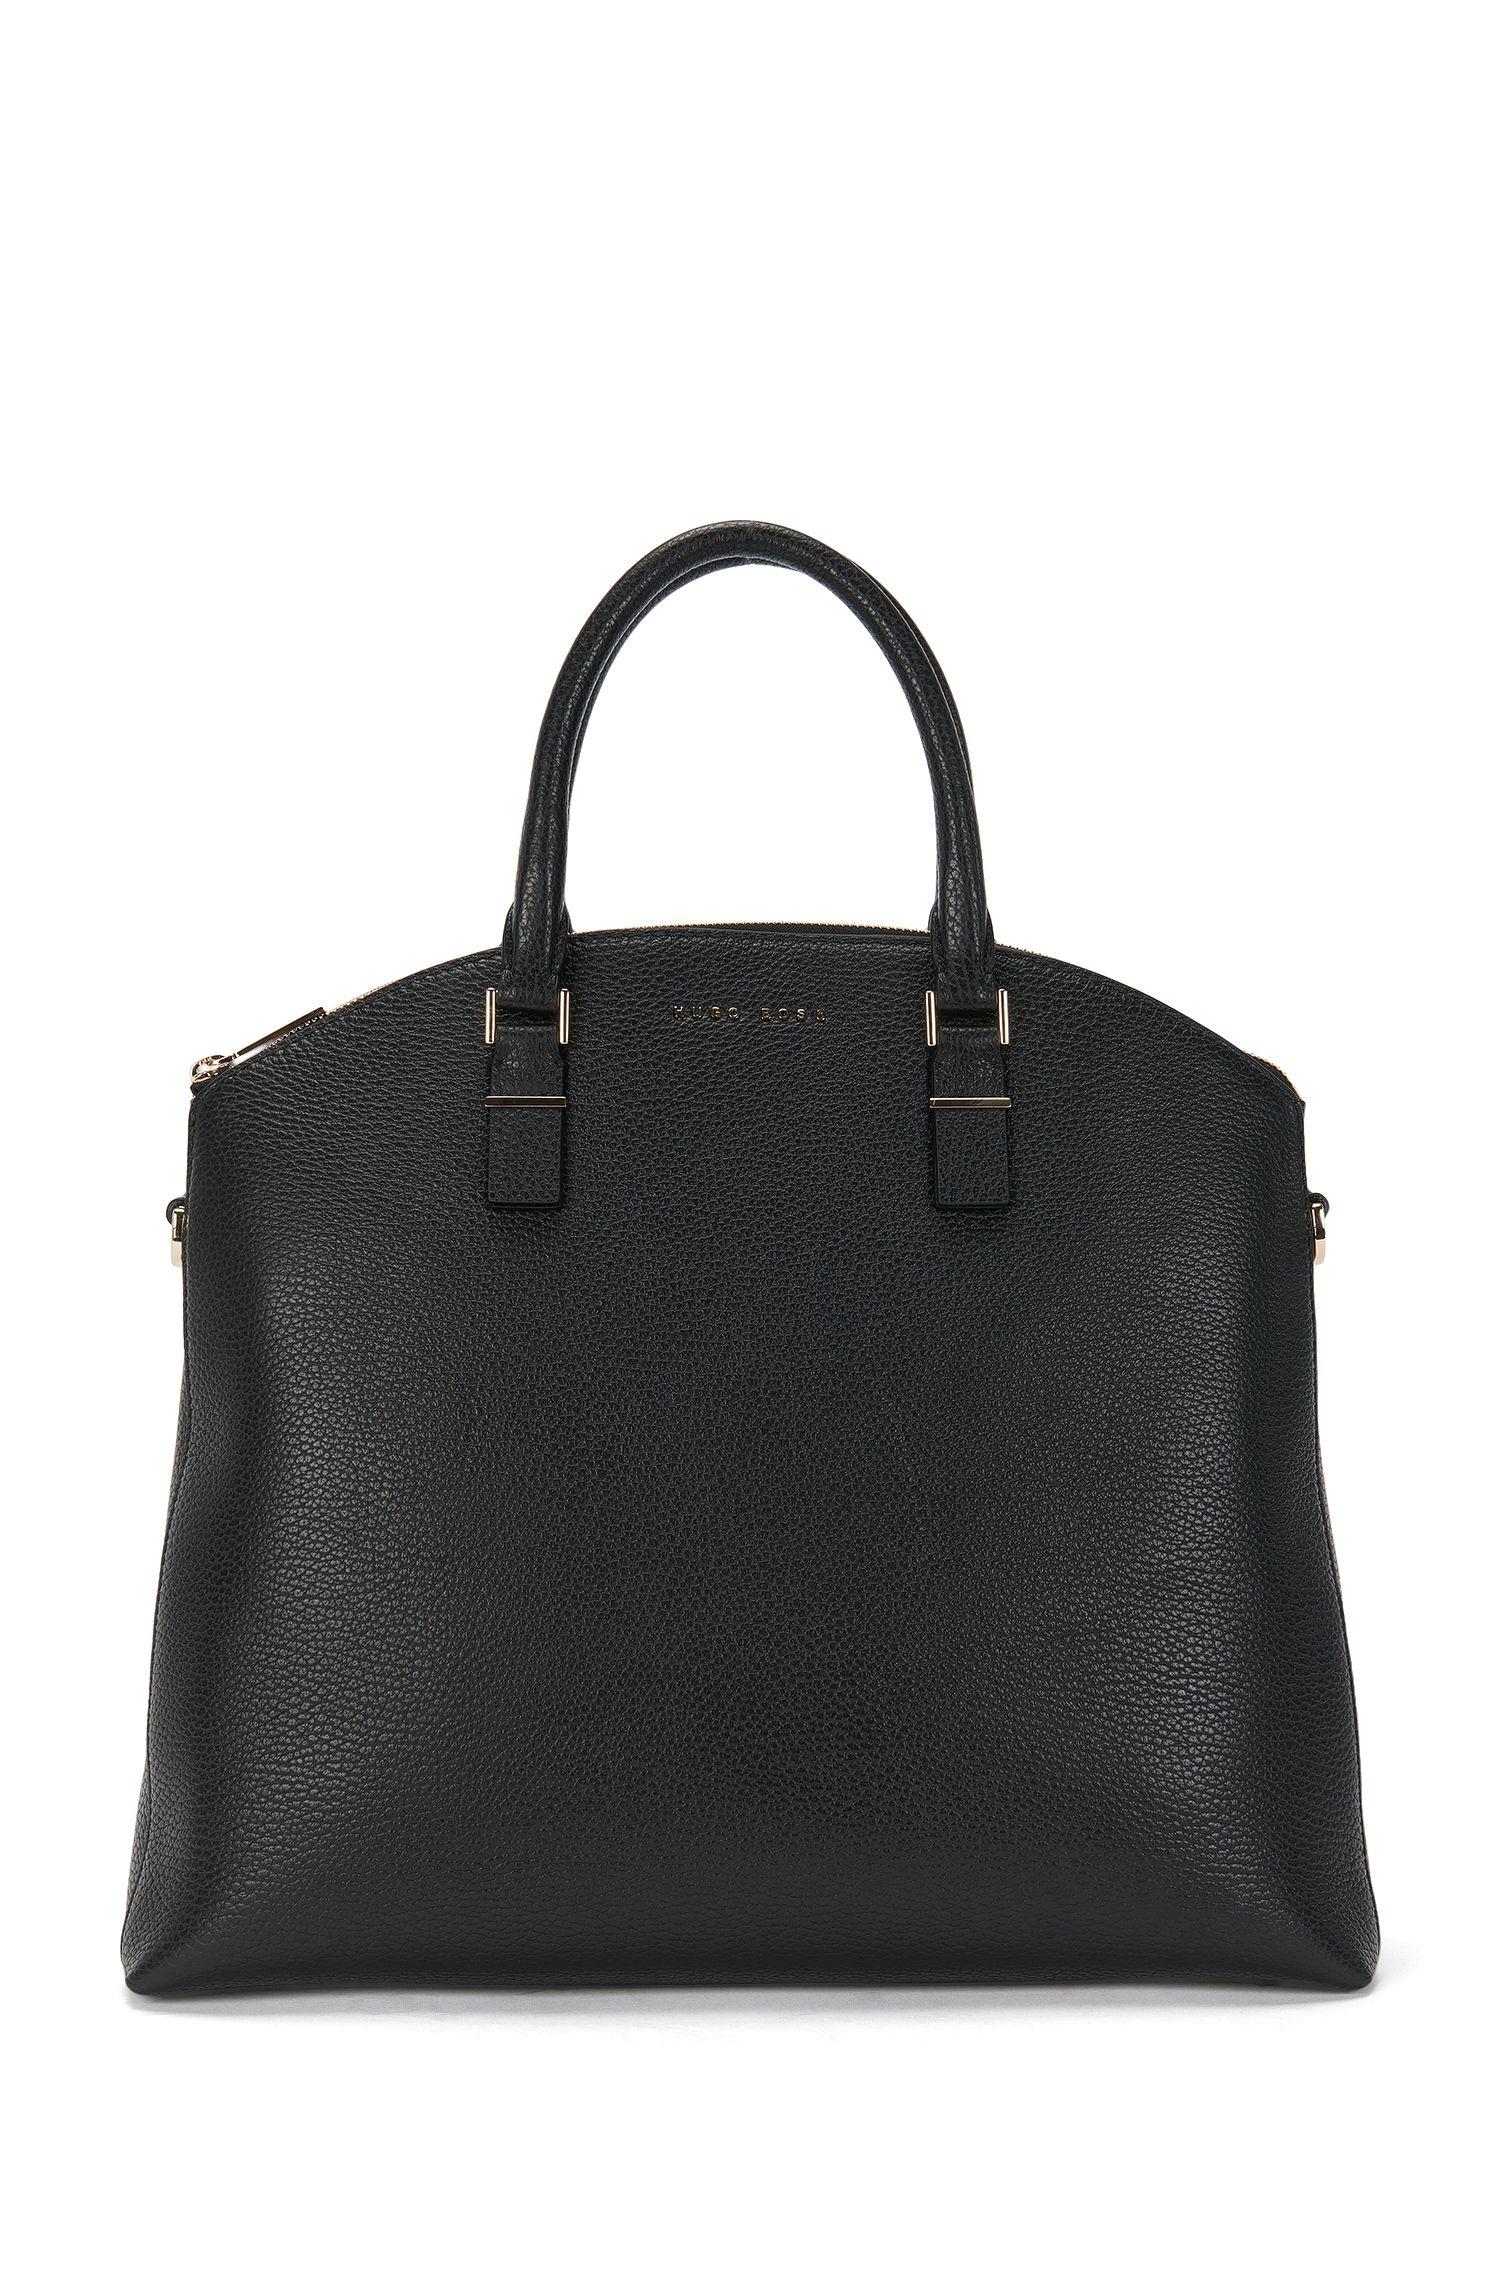 'Luxury S. Bugatti'   Leather Grained Shopper Handbag, Detachable Shoulder Strap